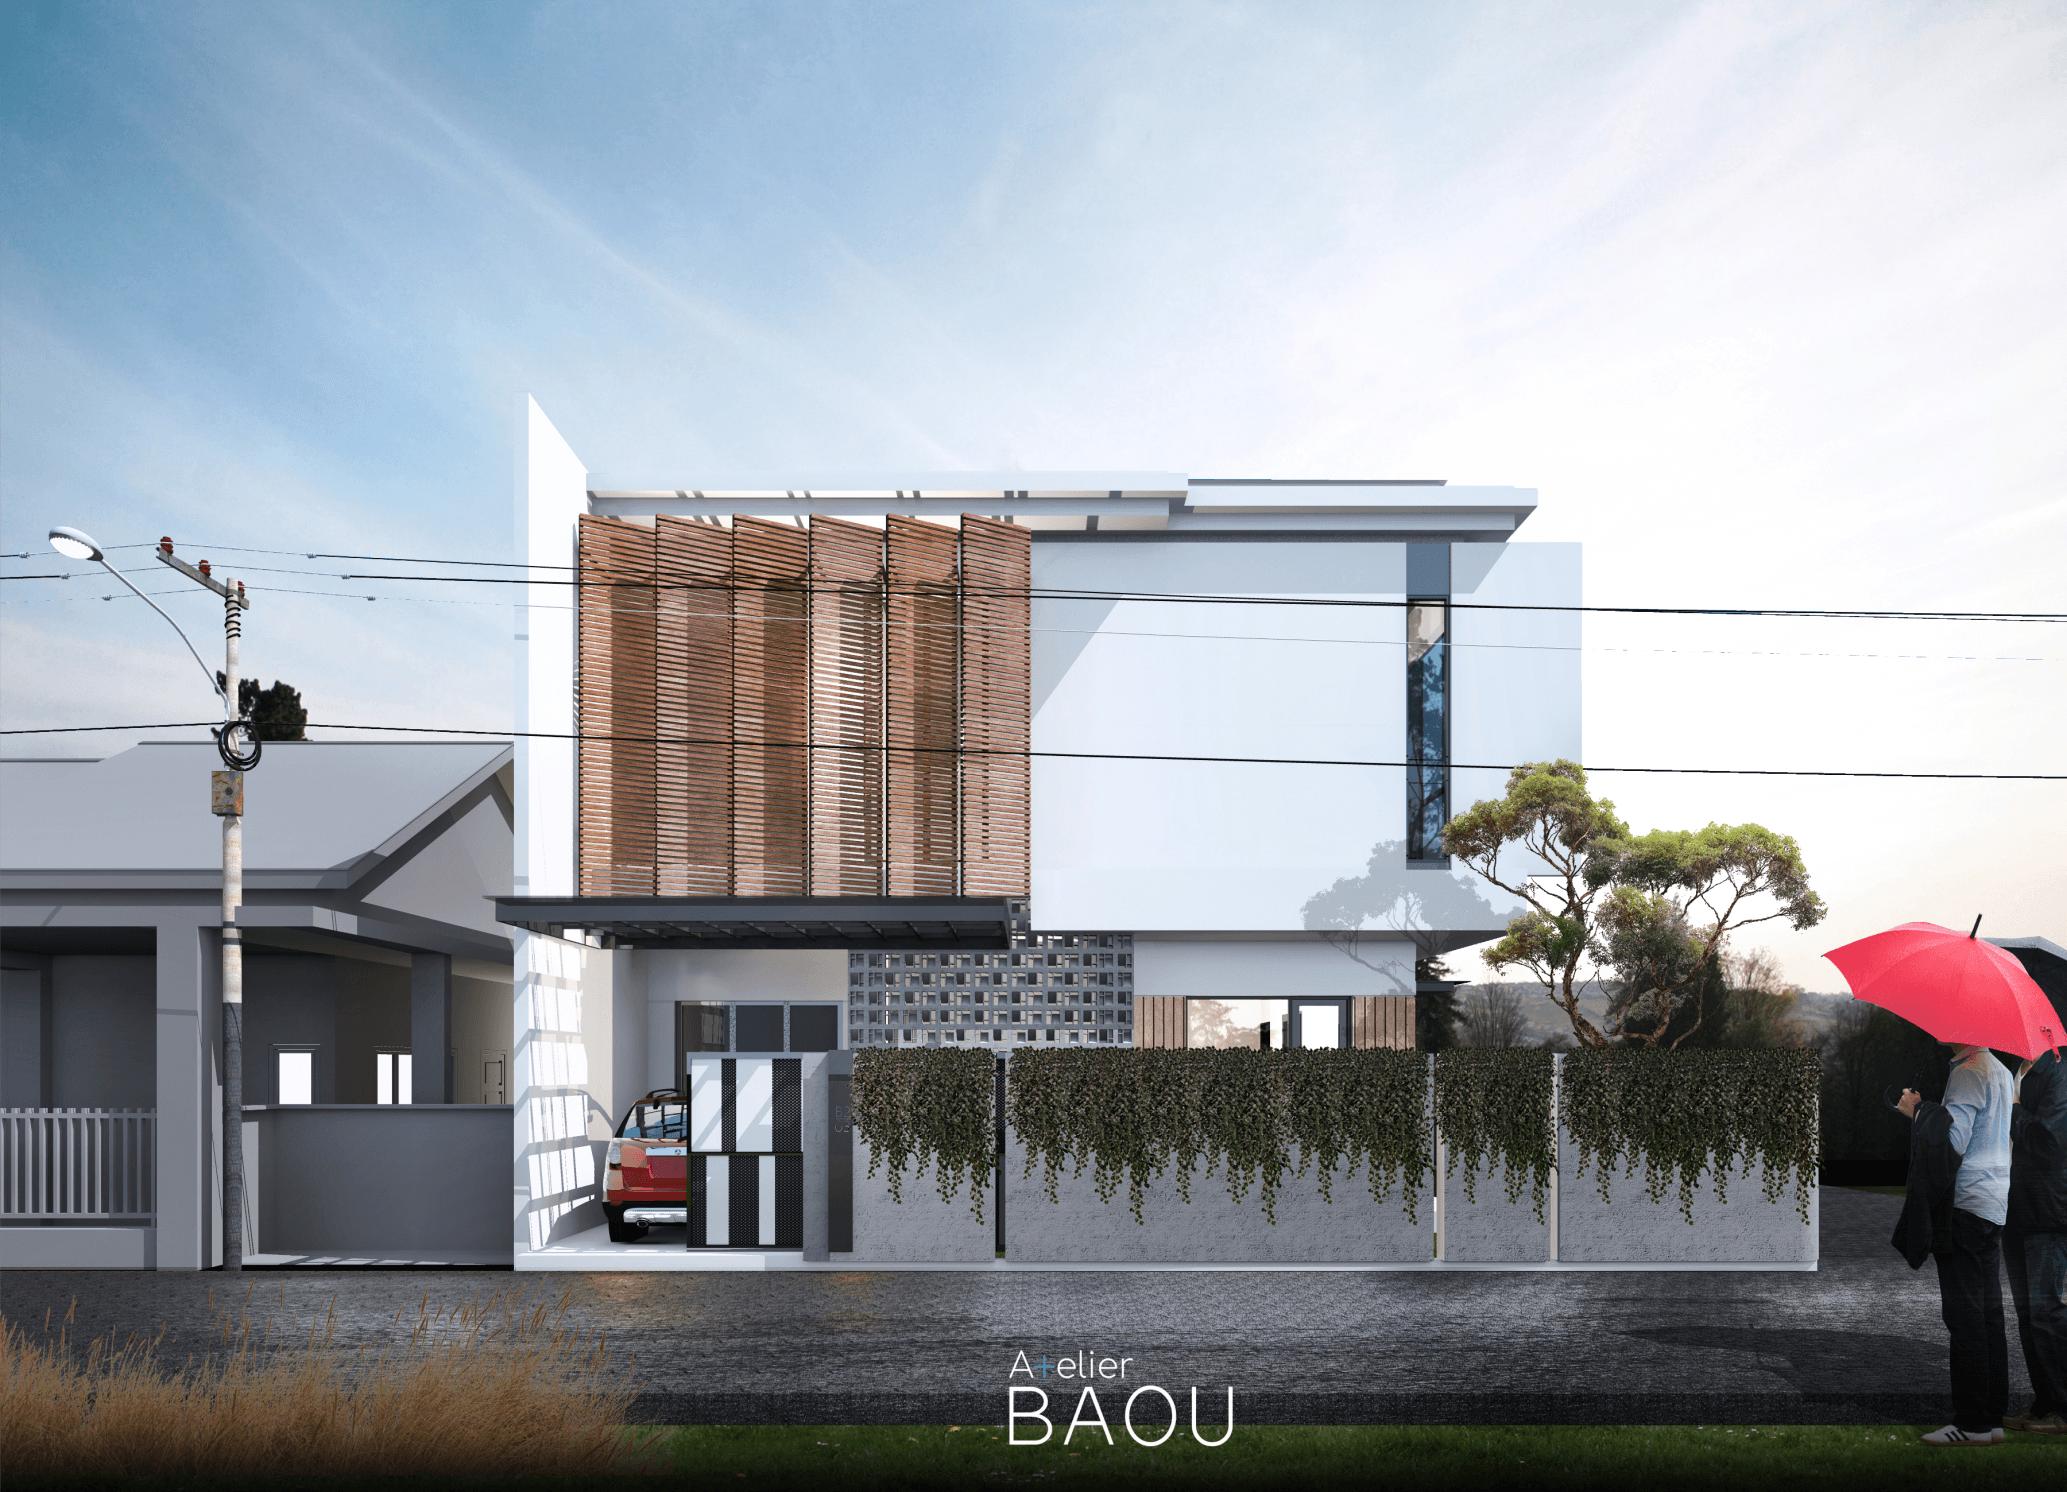 Atelier Baou Vc House Kec. Ciputat, Kota Tangerang Selatan, Banten, Indonesia Kec. Ciputat, Kota Tangerang Selatan, Banten, Indonesia Atelier-Baou-Vc-House  86484